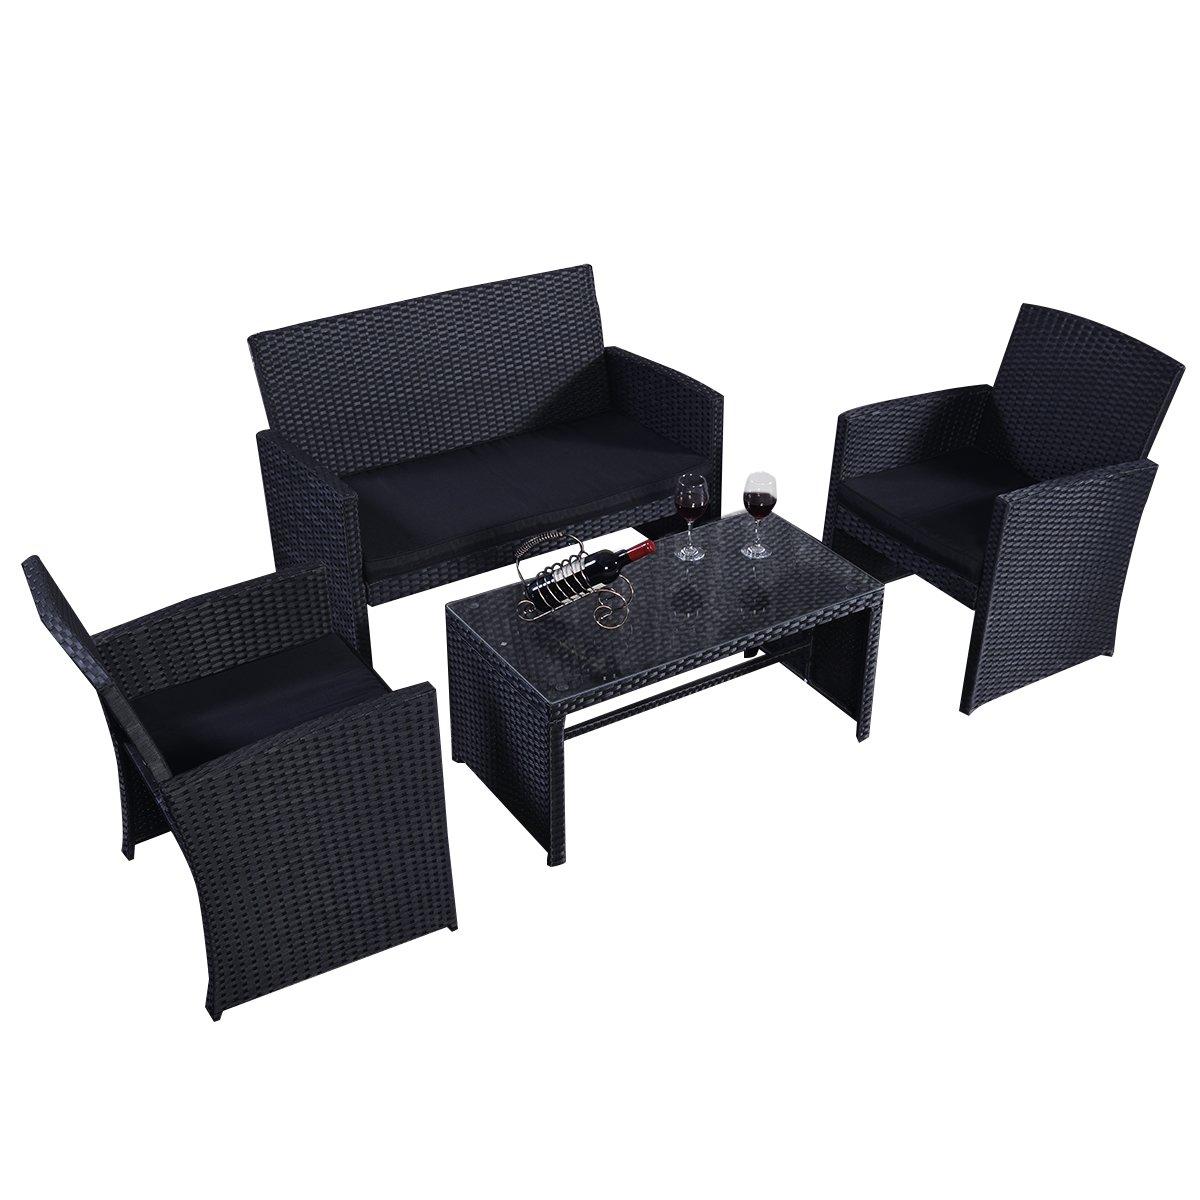 Rattan Set Rattanmöbel Gartenmöbel Lounge Polyrattan Sitzgruppe Garnitur Garten